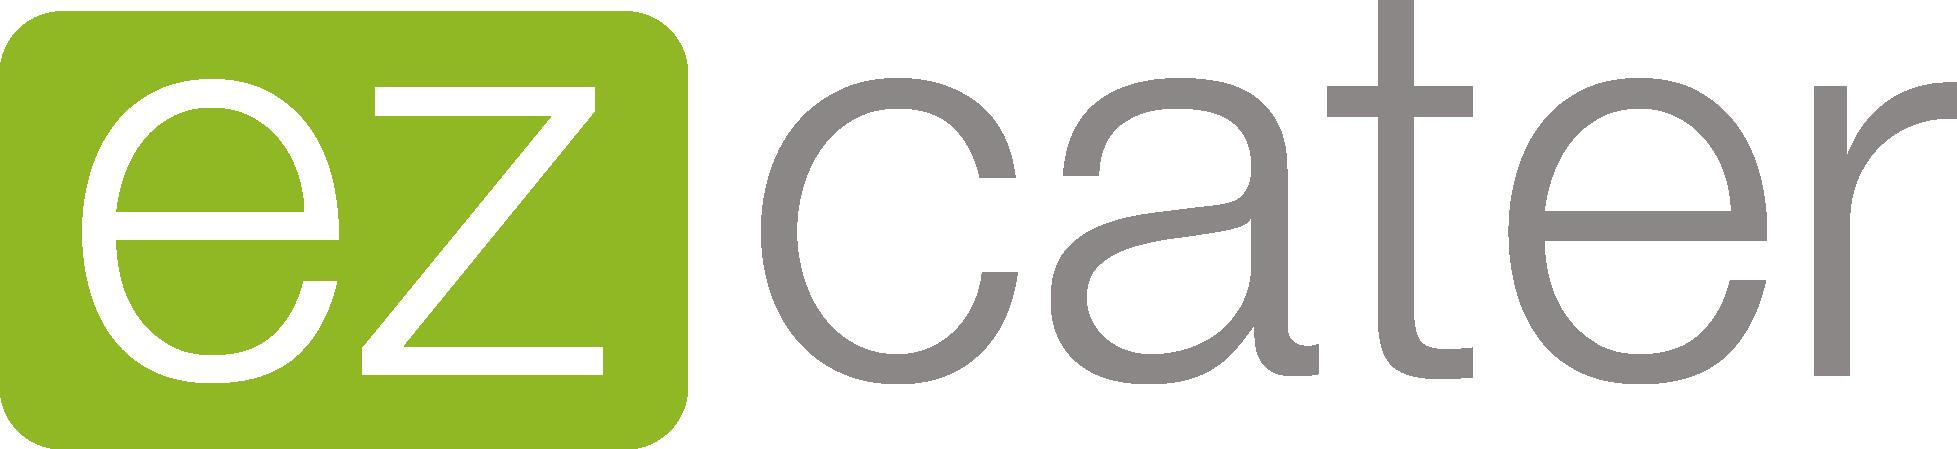 EZcater logo